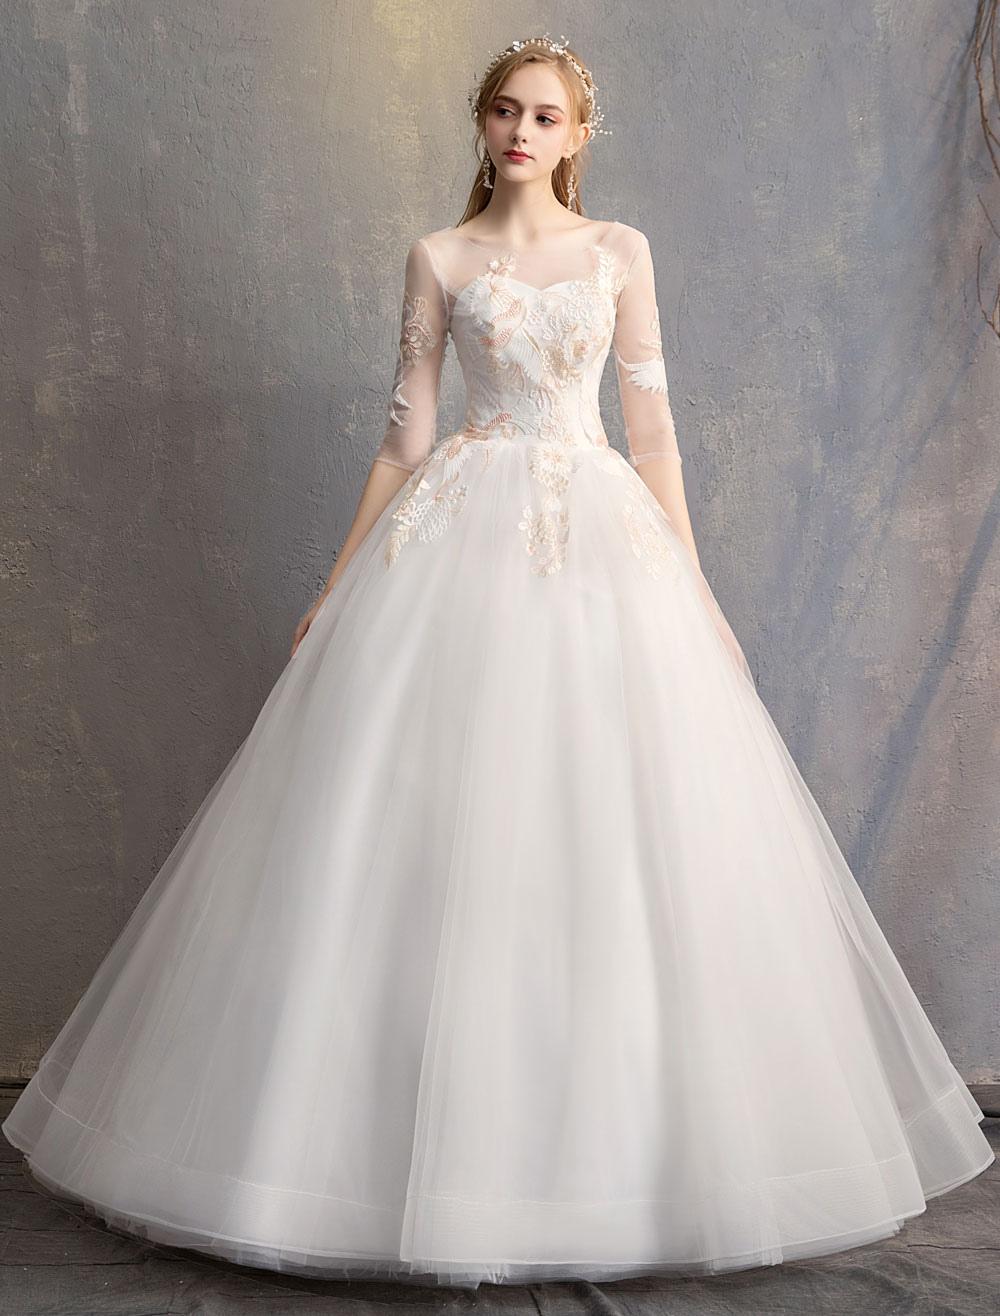 c0b8faa0c Vestido De Baile Princesa Vestidos De Noiva Marfim Meia Manga Backless  Applique Vestido De Noiva- ...